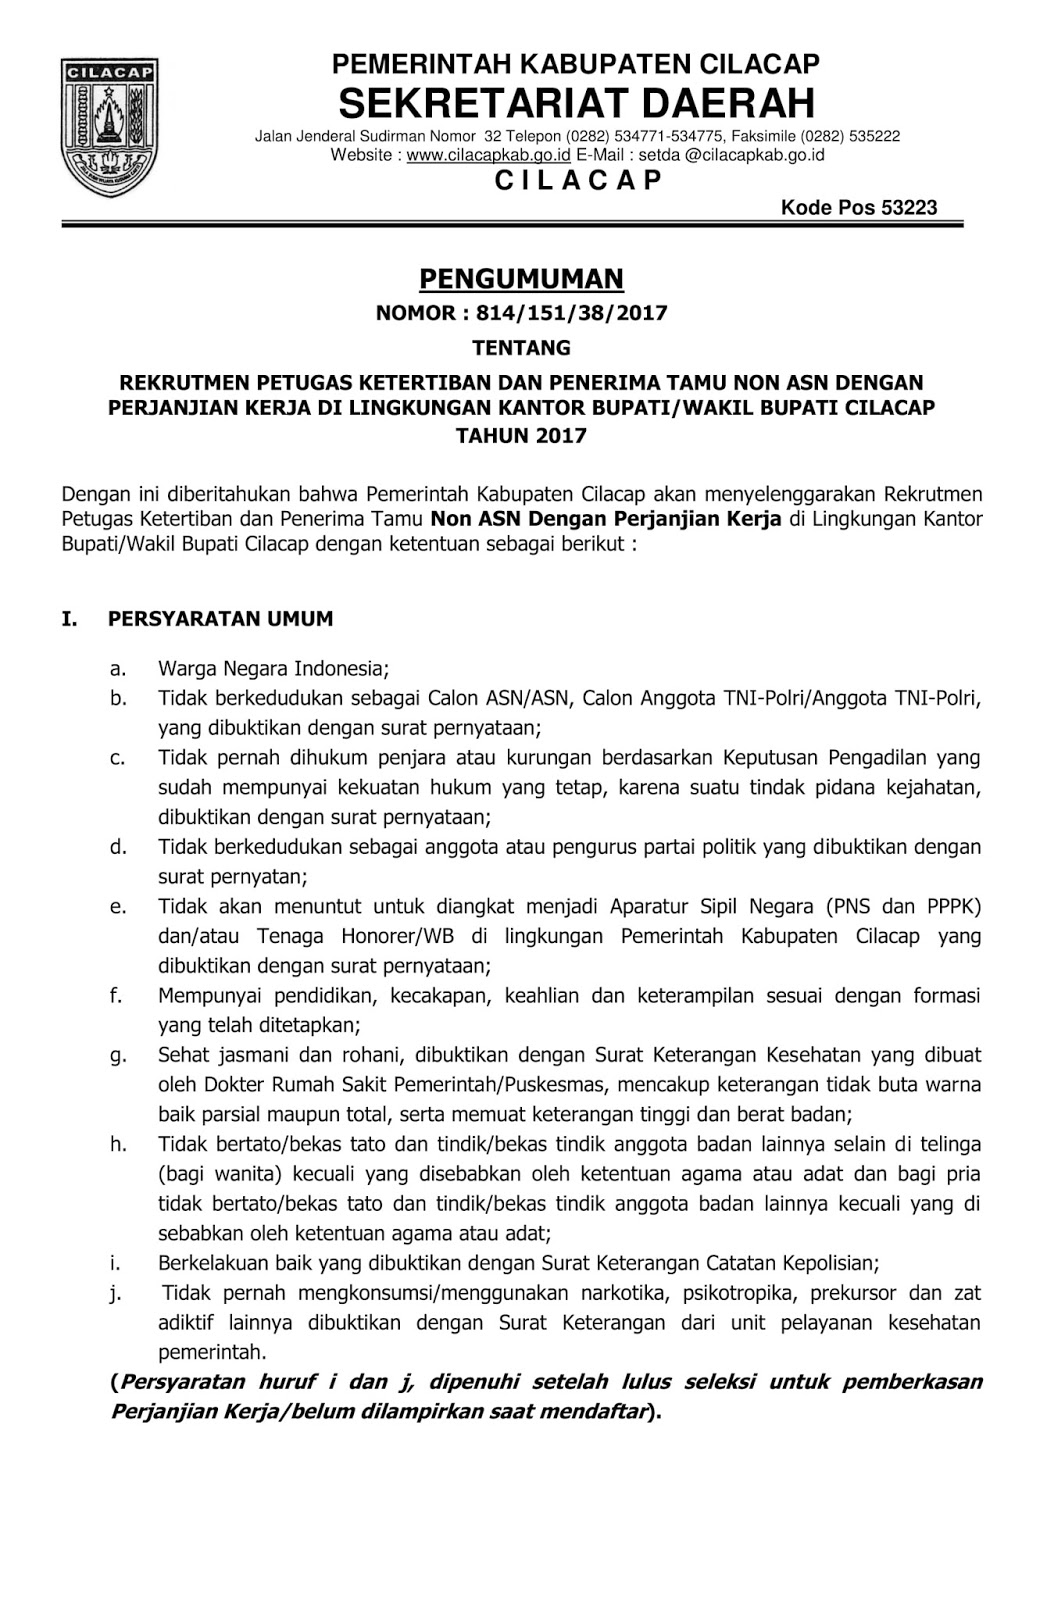 Lowongan Kerja   Non ASN Lingkungan Kantor Bupati/Wakil Bupati Cilacap Tingkat SMA D3  Agustus 2018